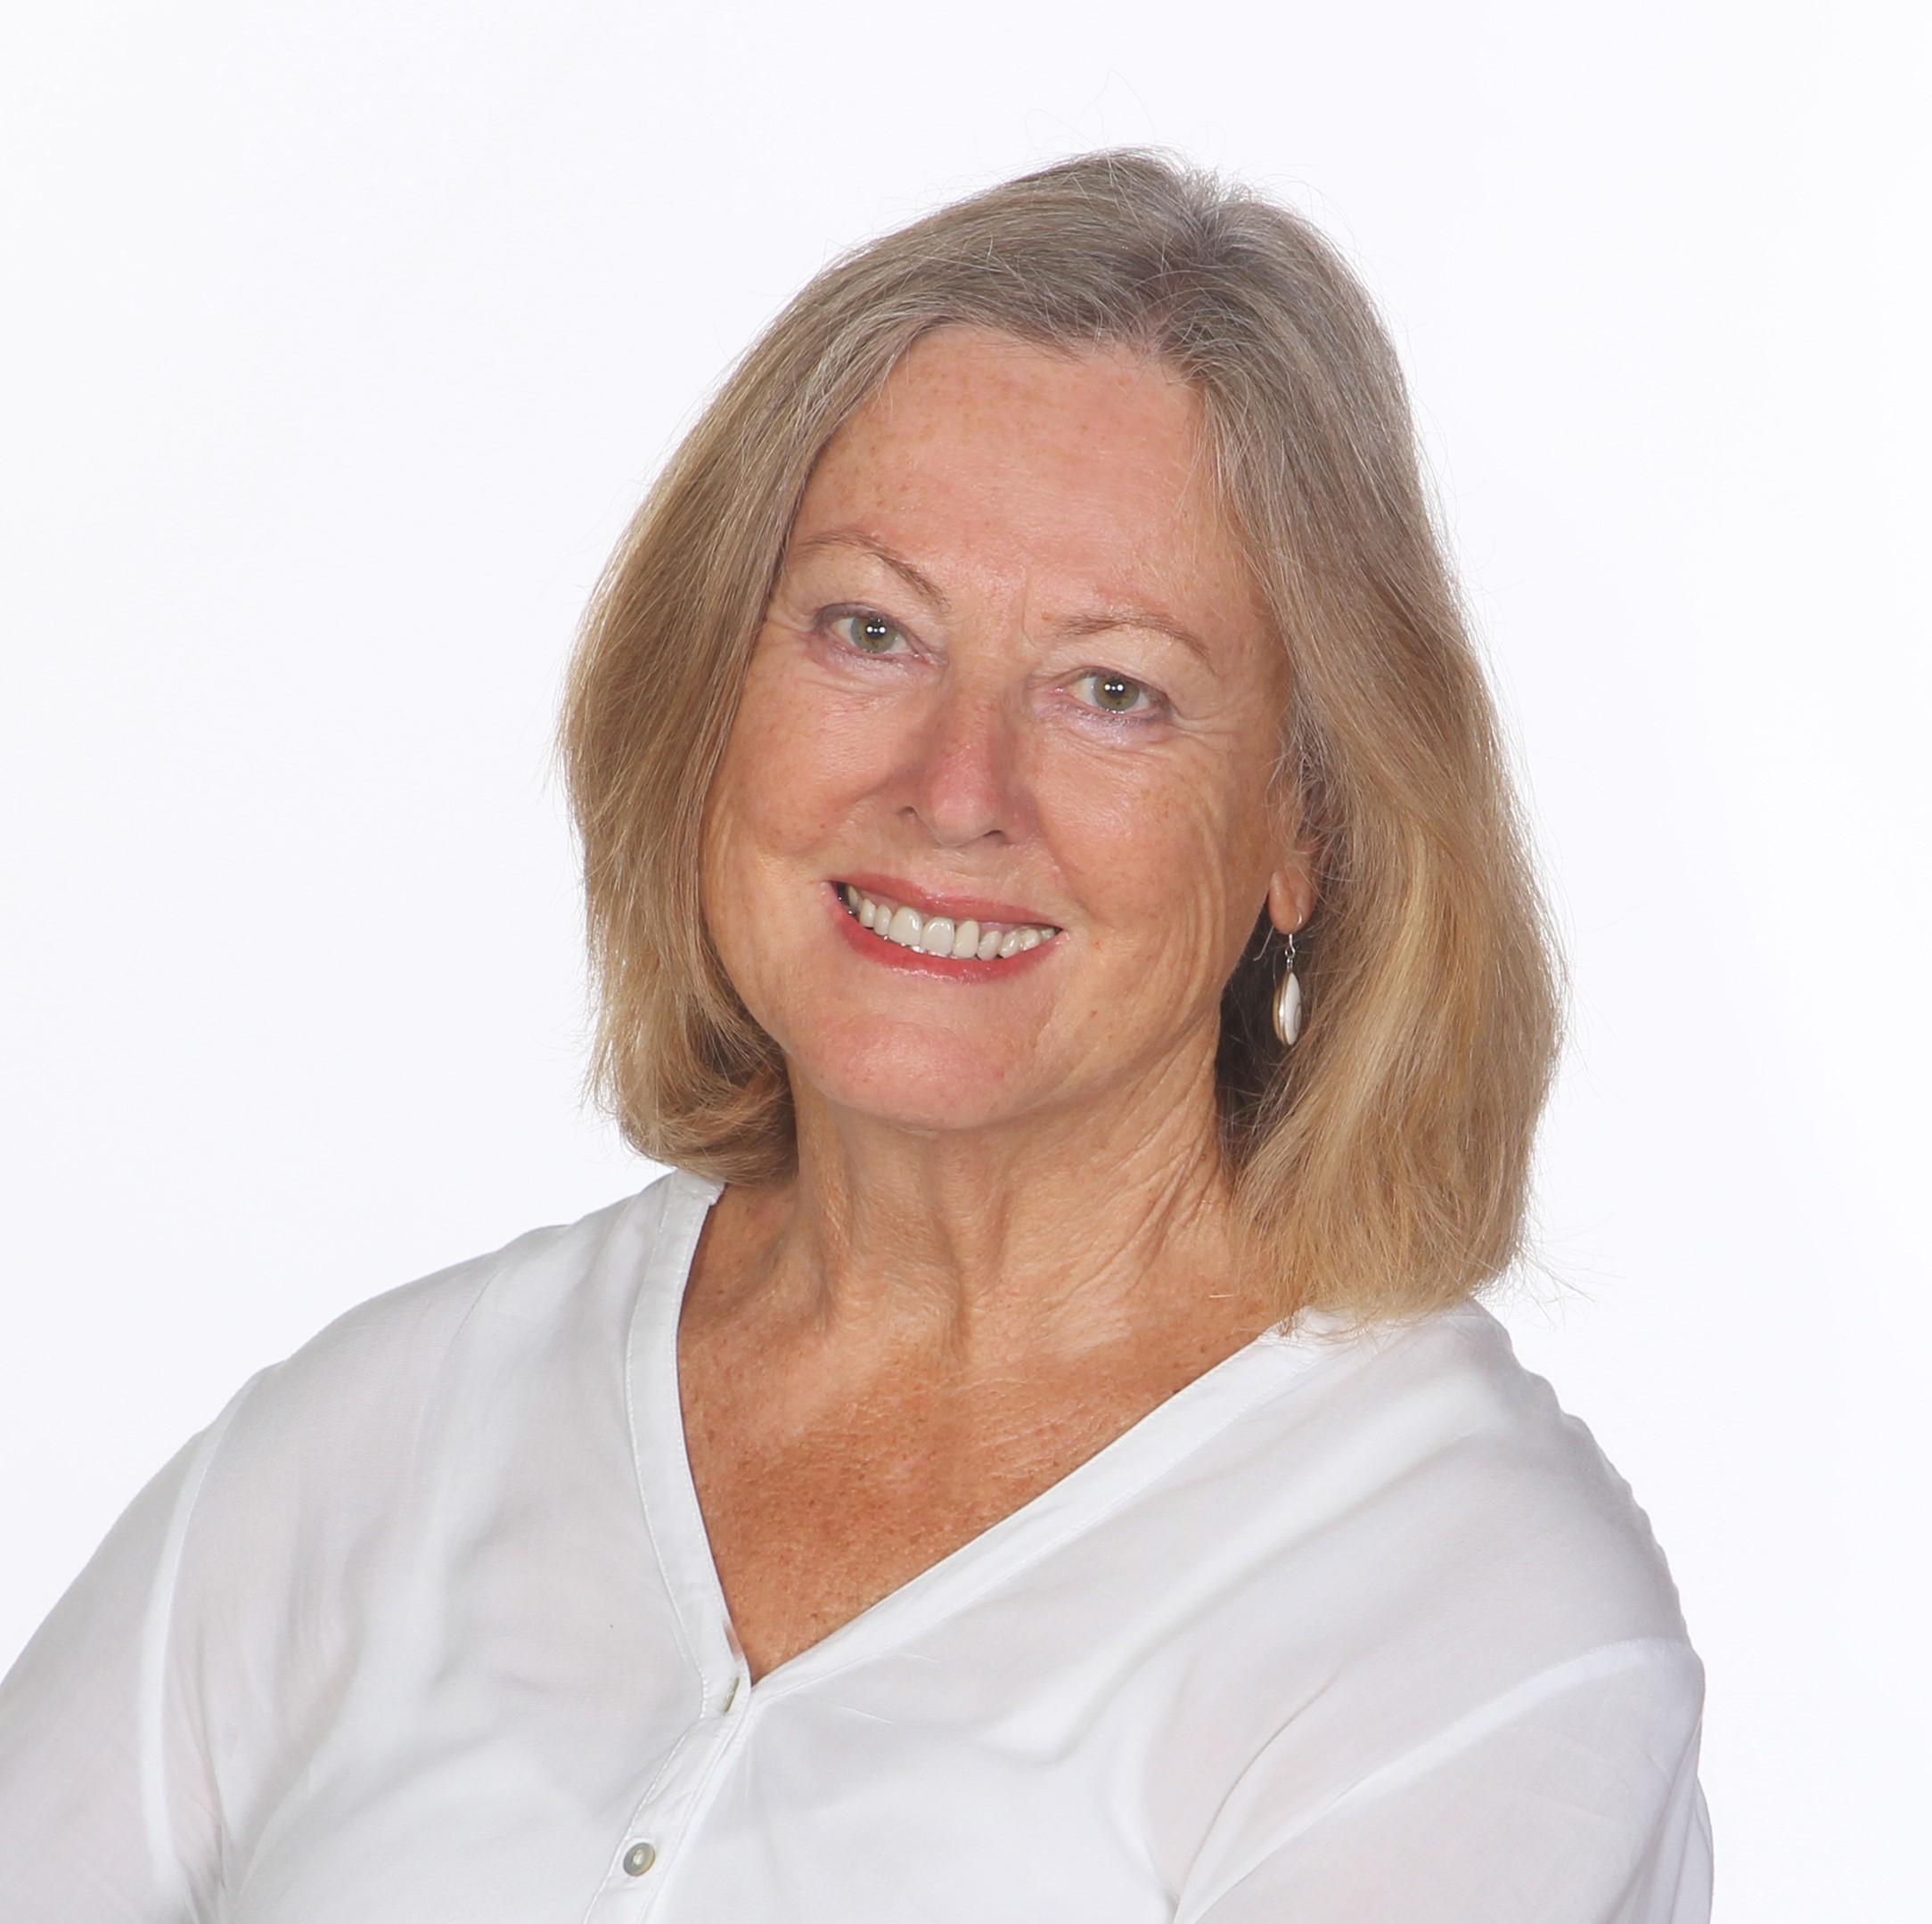 Christiane Pappenscheller-Simon